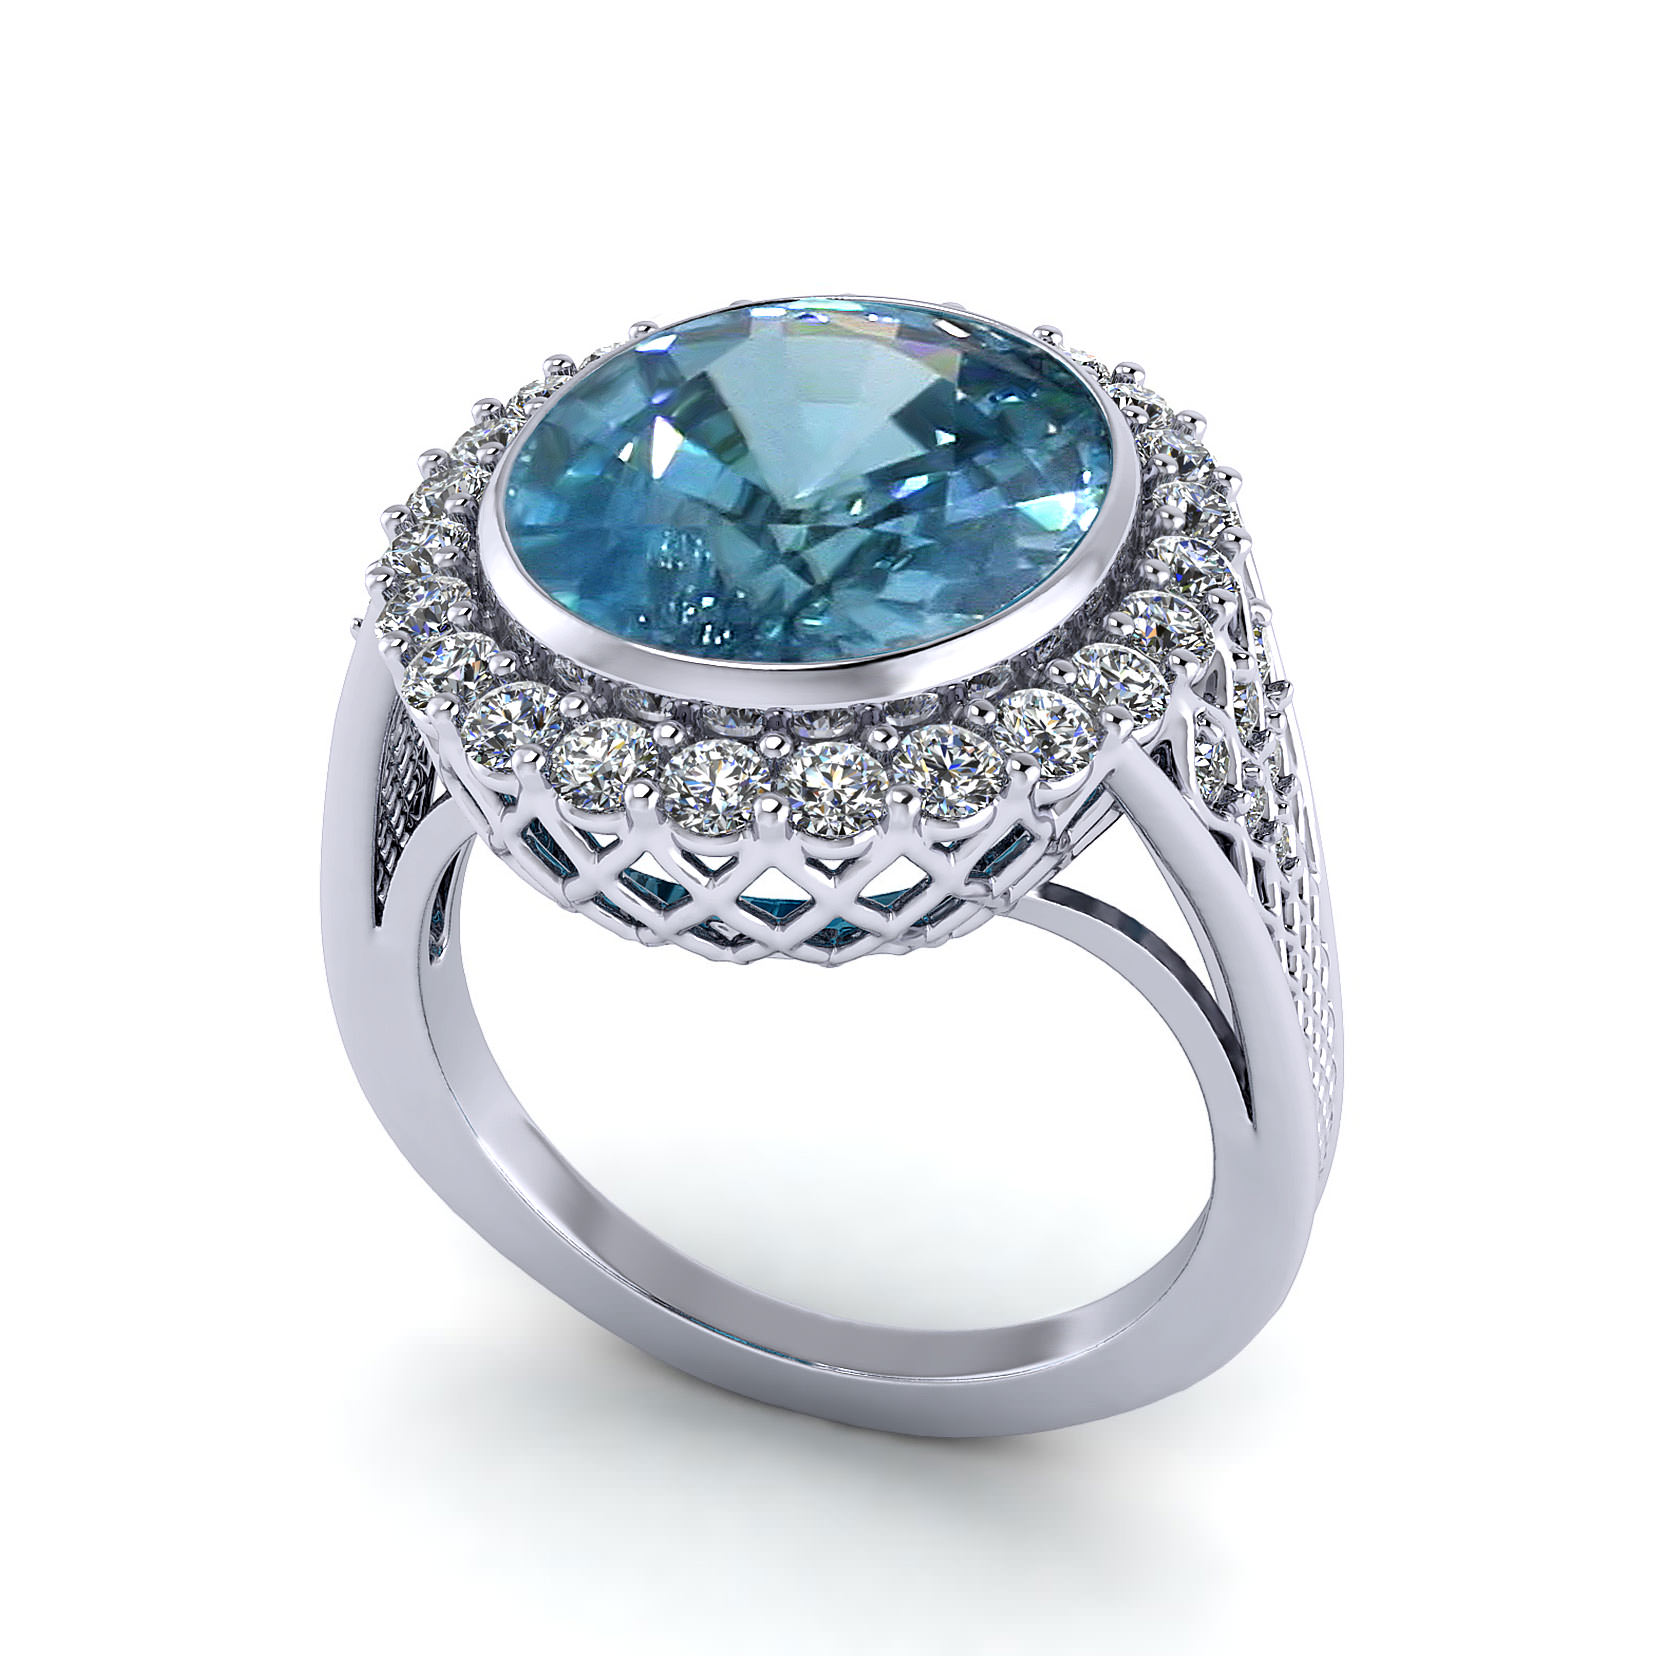 Super Filigree Blue Zircon Ring | Jewelry Designs UJ21